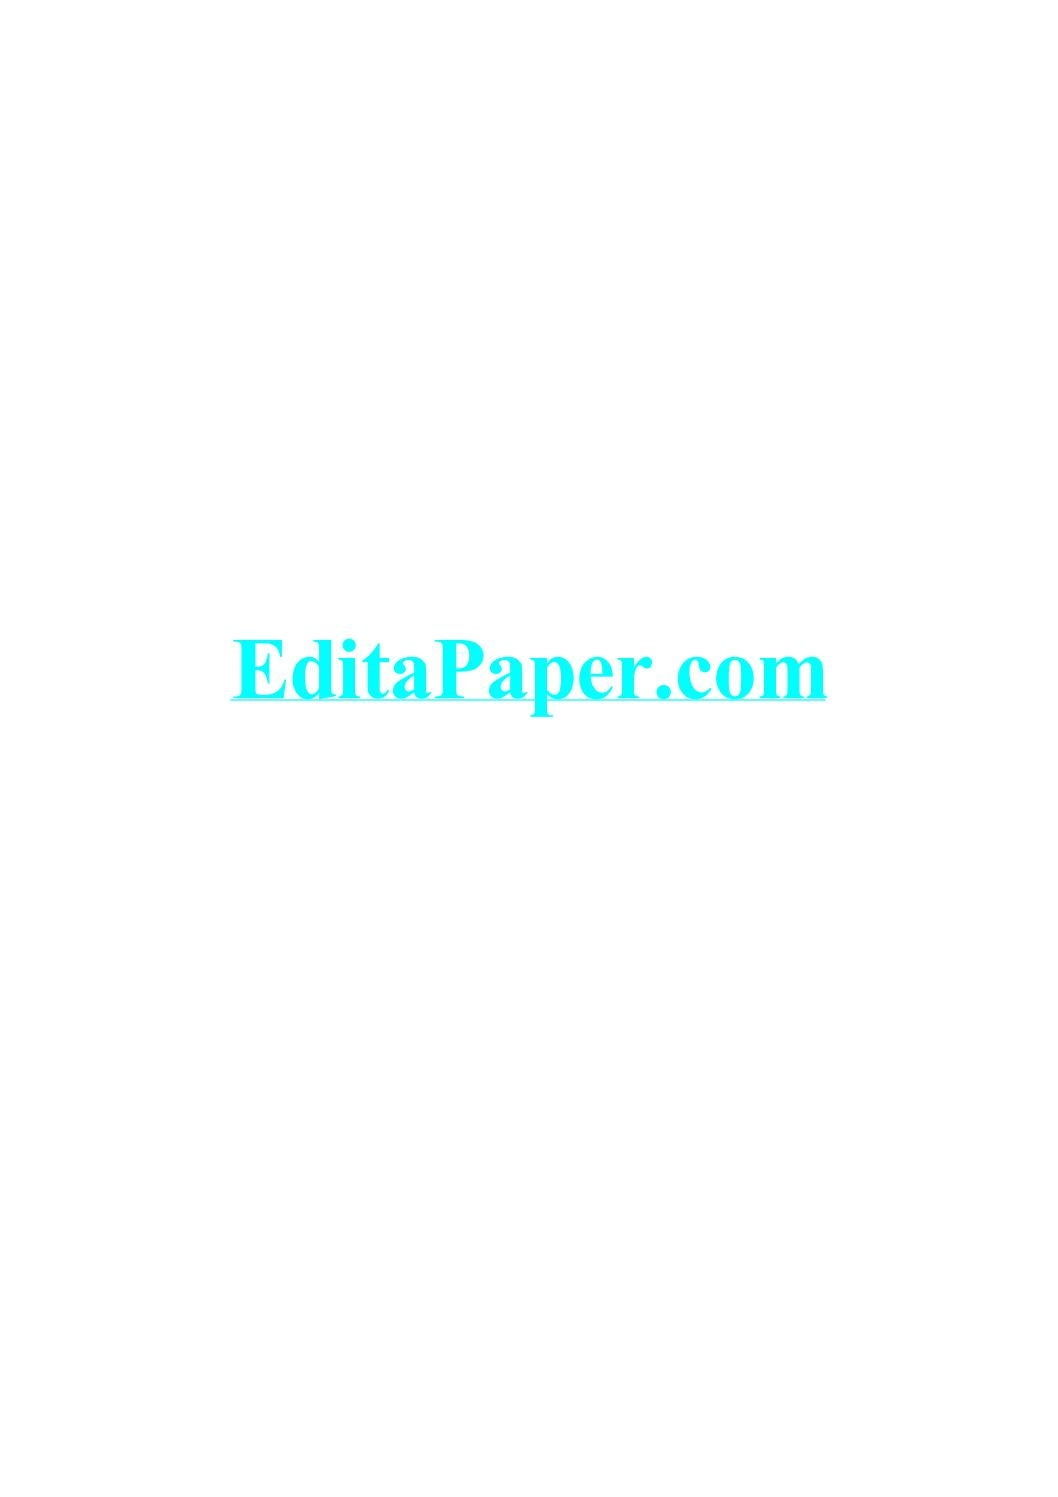 Descriptive writing services us